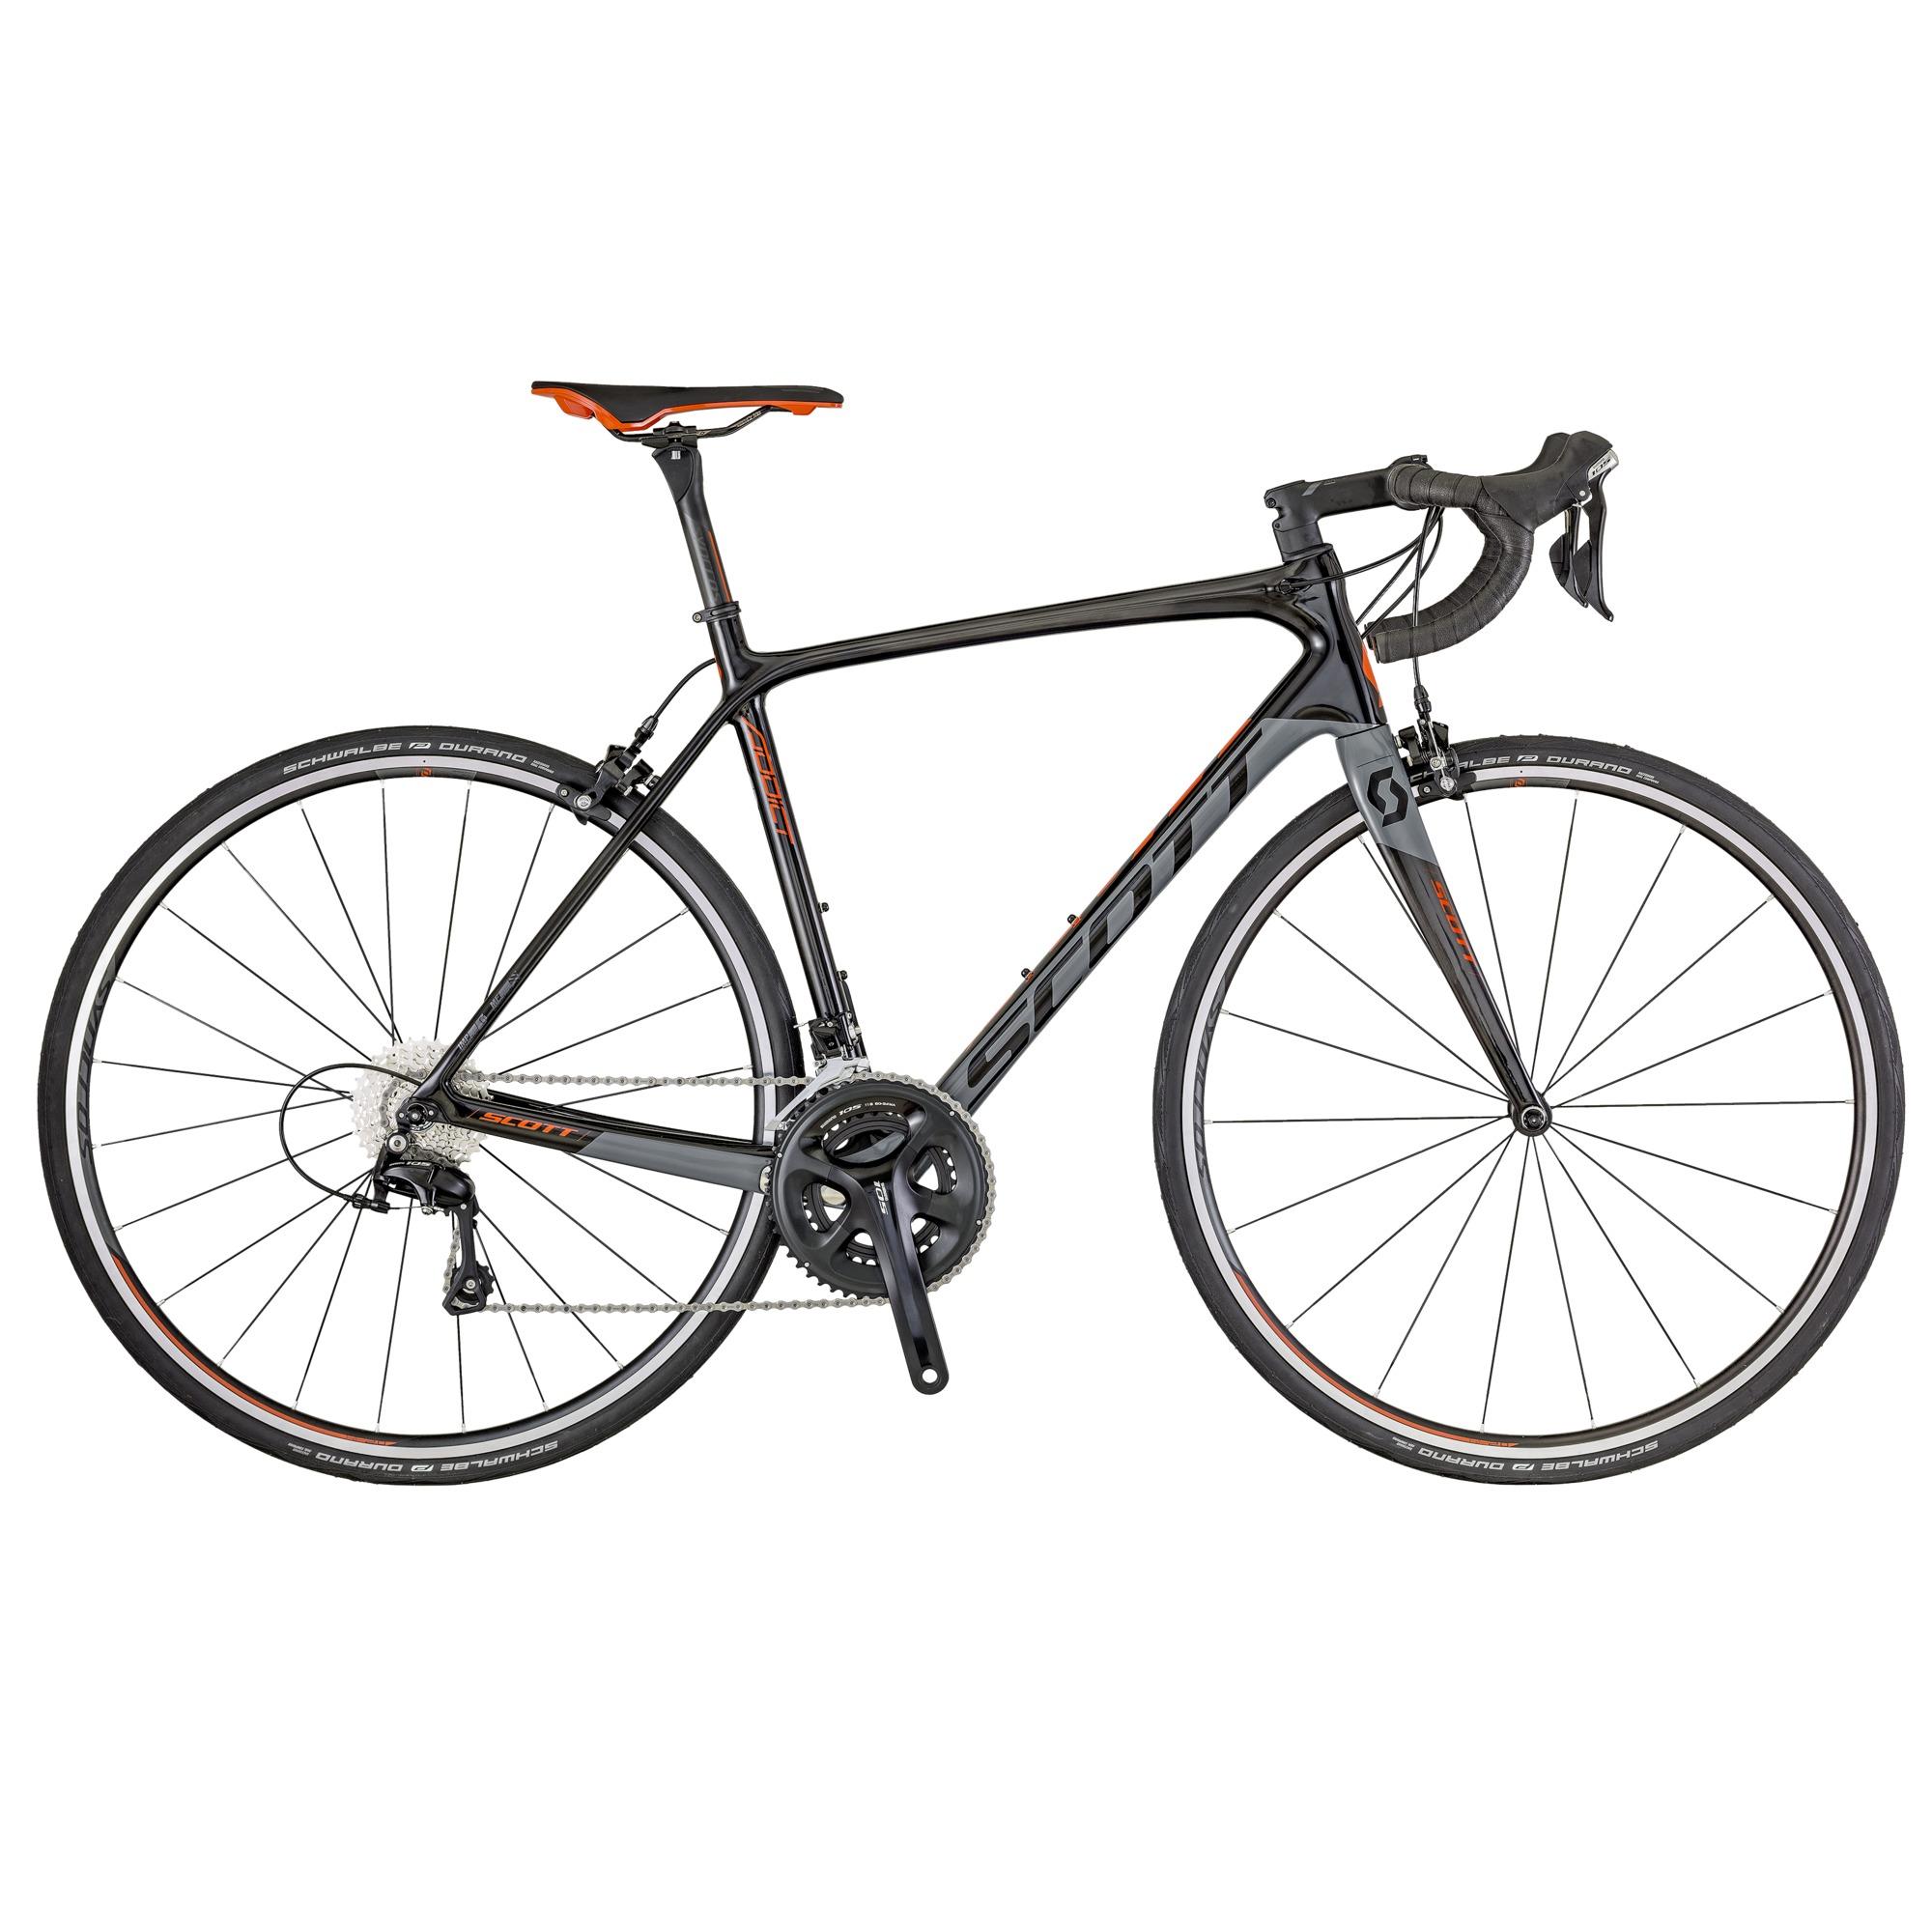 SCOTT Addict 20 Bike 2XL61 - Zweirad Homann